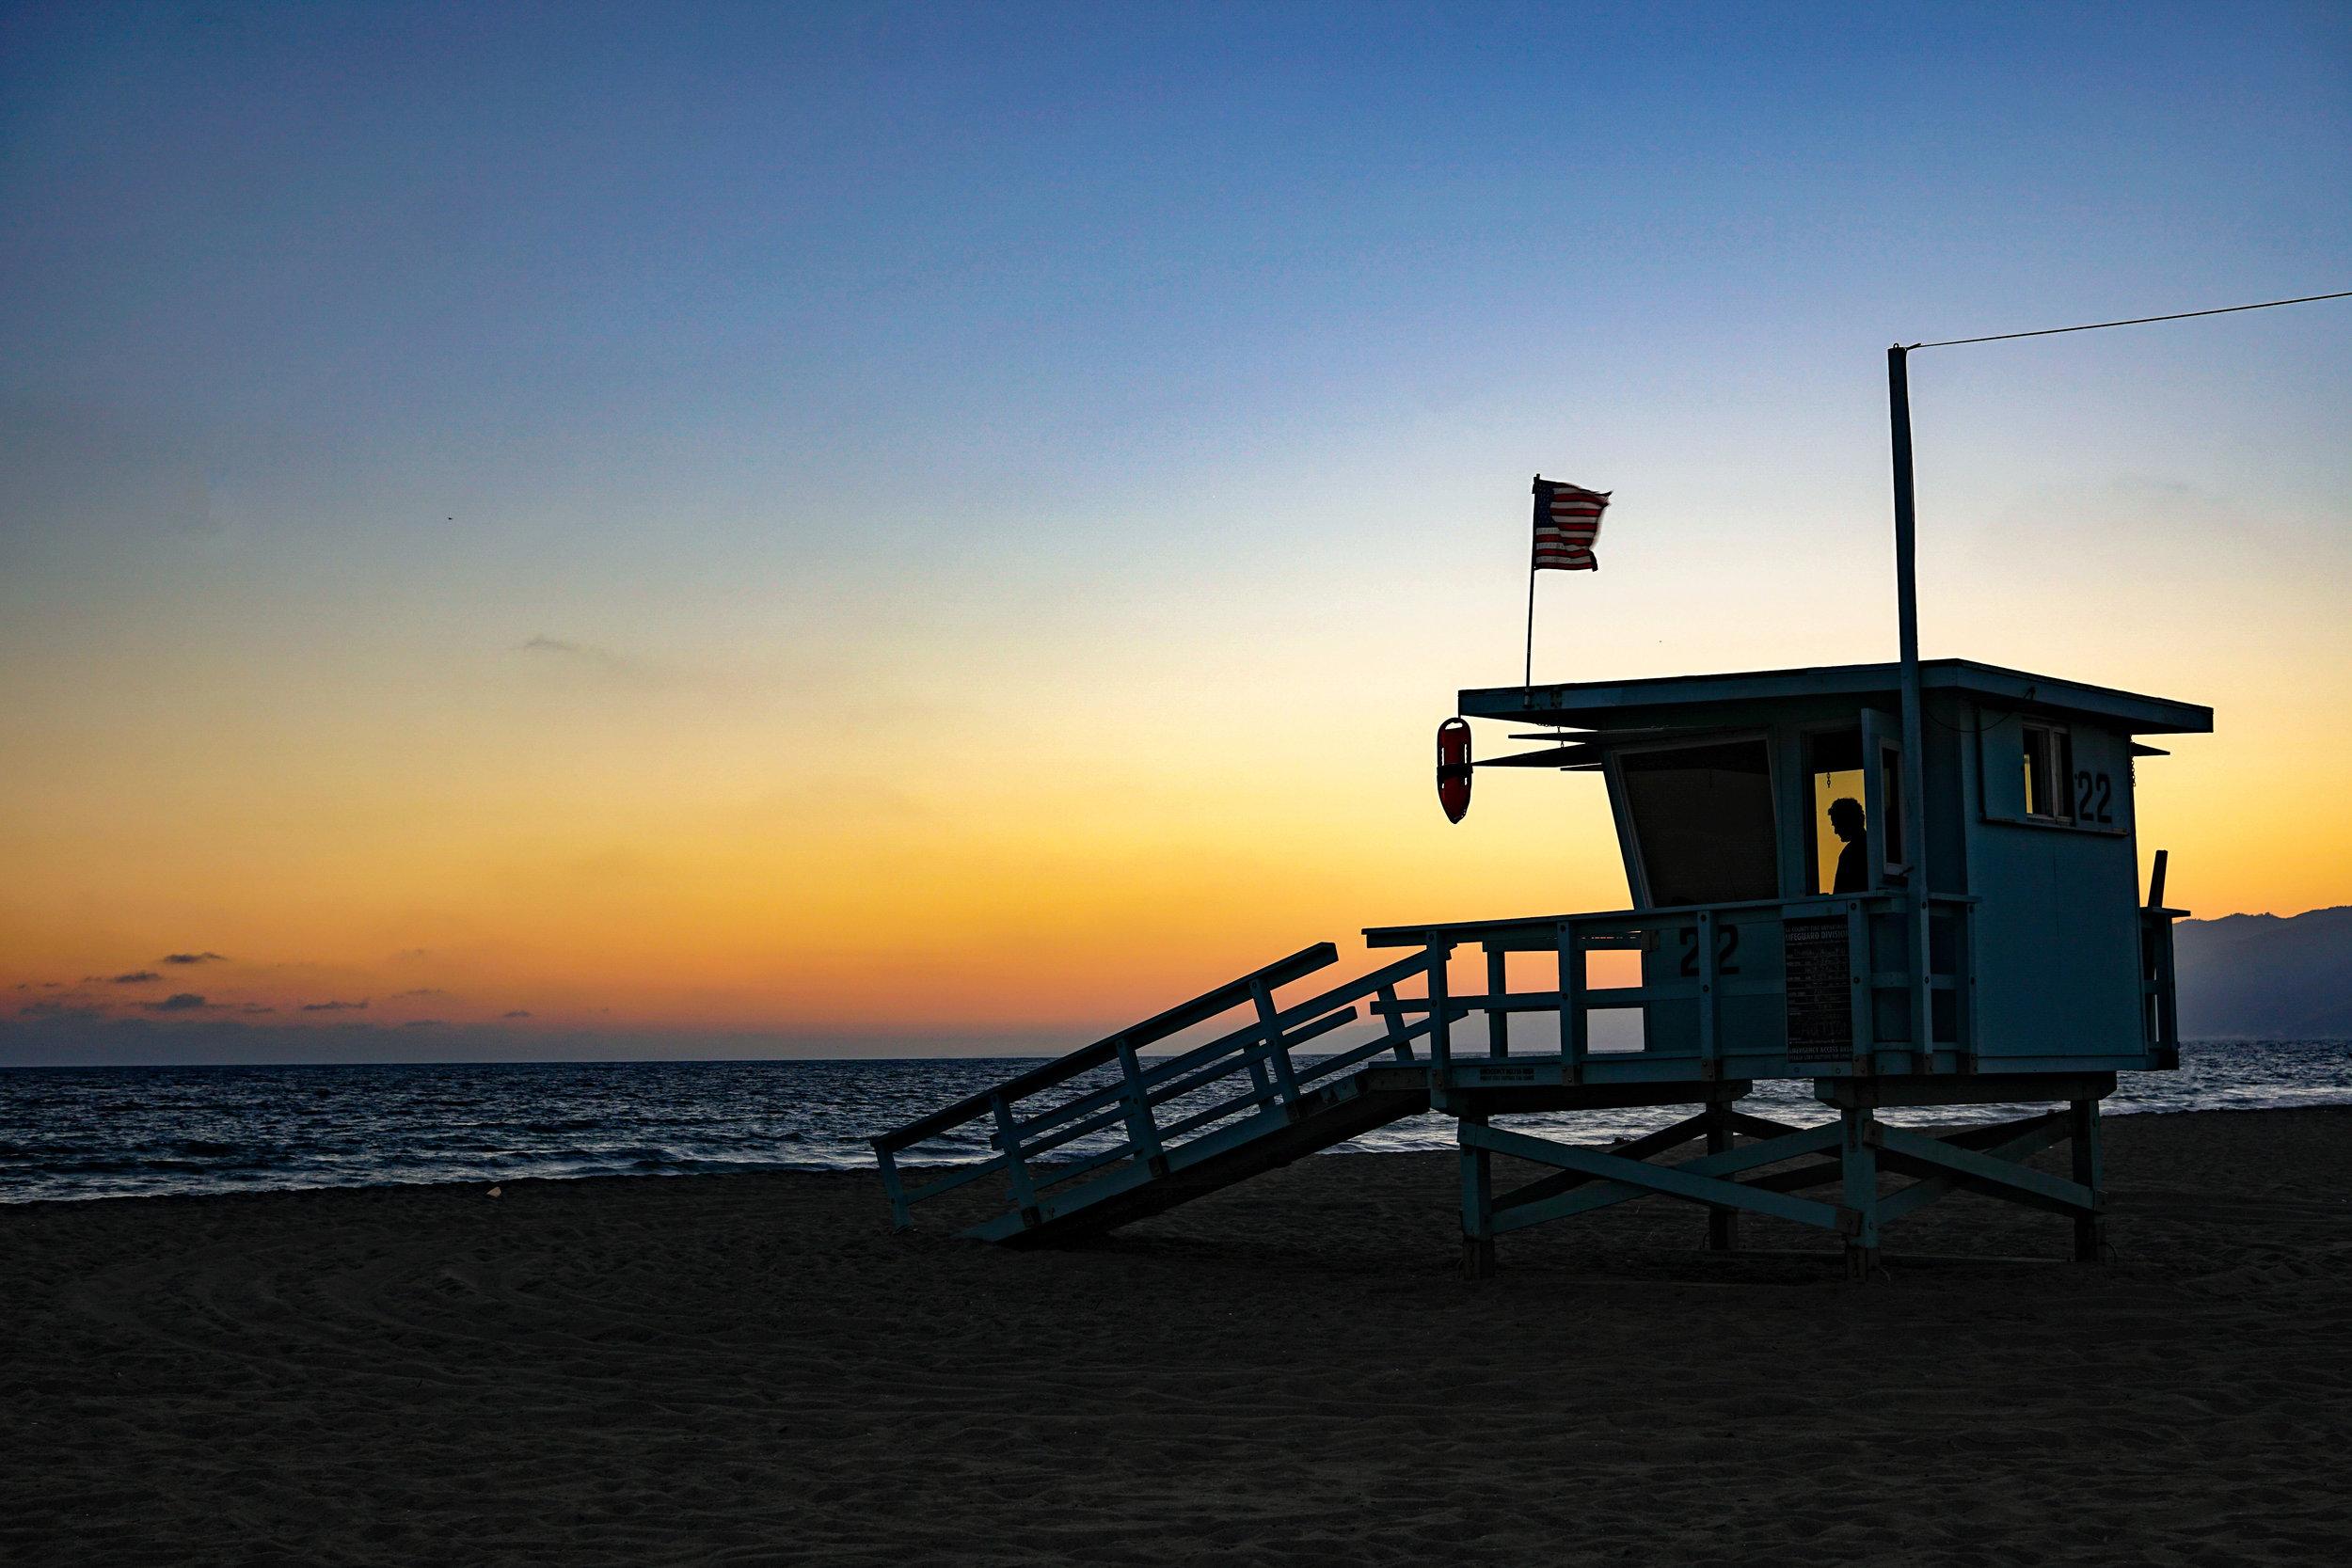 1. Beach sunsets at Santa Monica